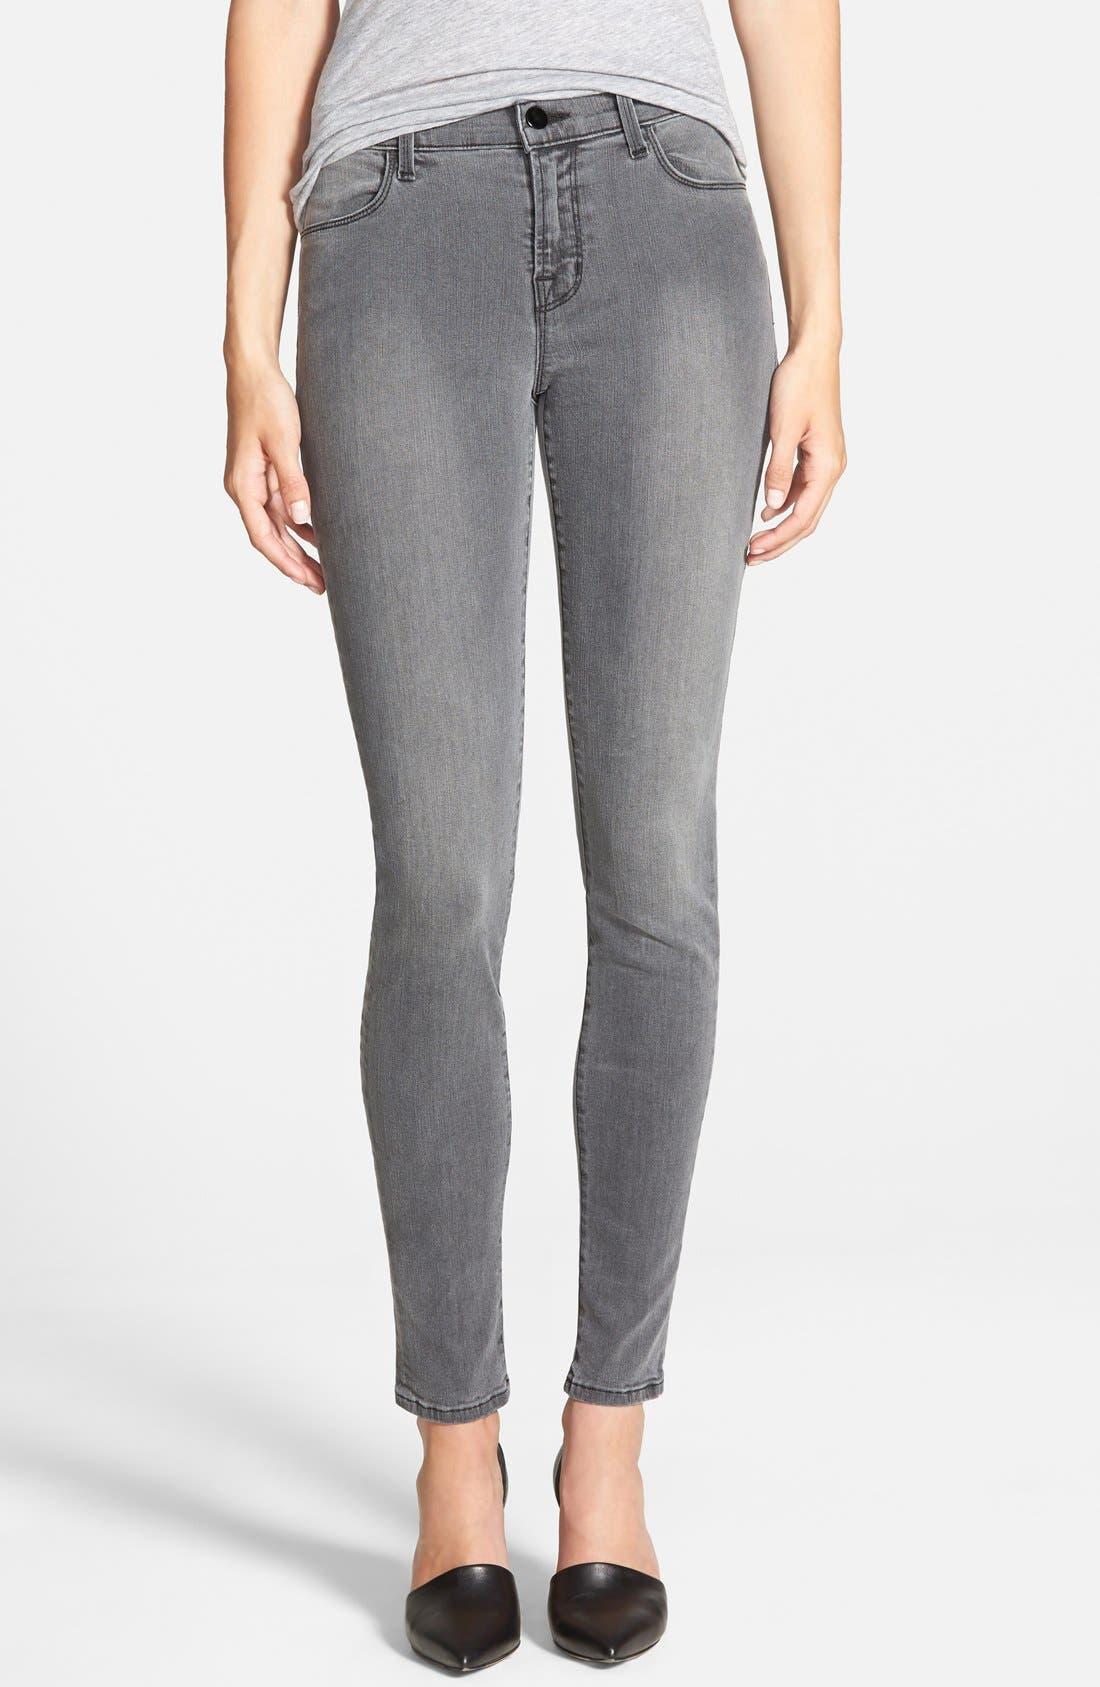 Alternate Image 1 Selected - J Brand '620' Mid Rise Skinny Jeans (Nightbird)